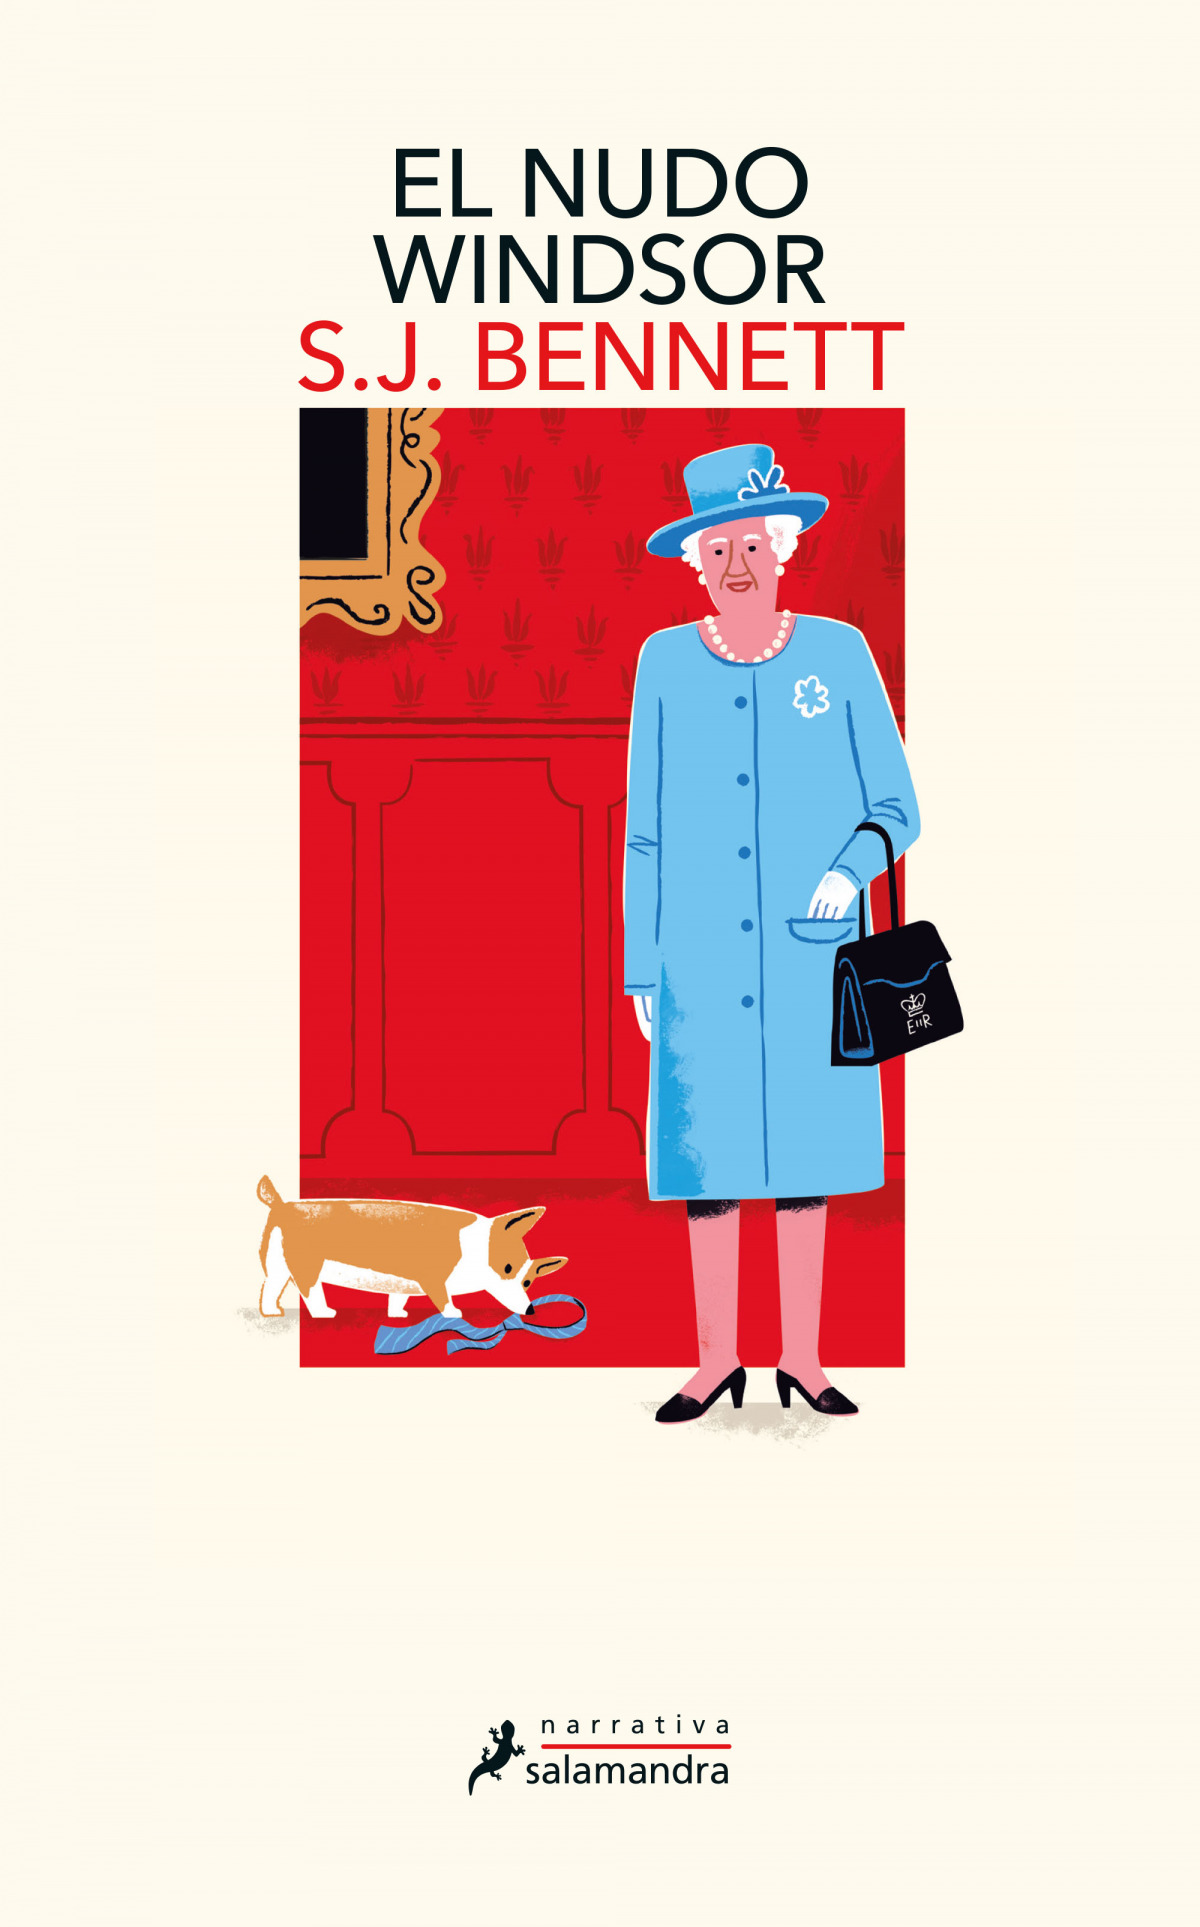 El nudo Windsor (Su Majestad, la reina investigadora 1)